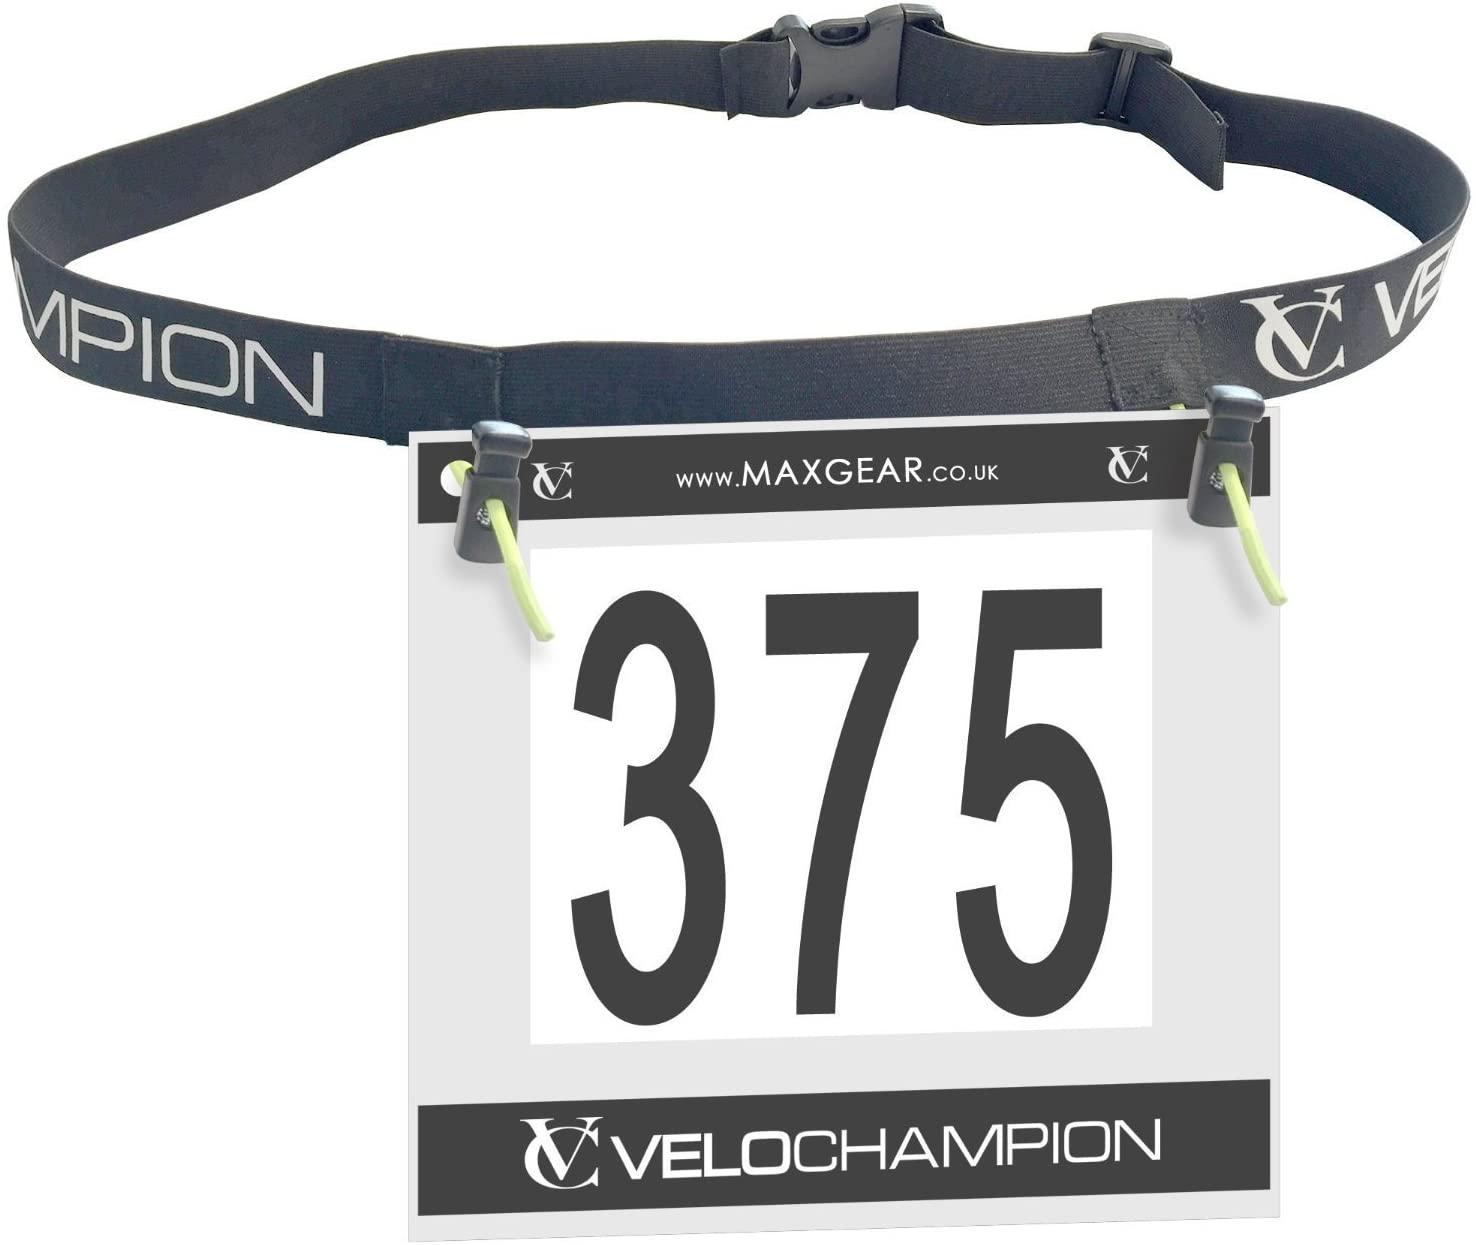 VeloChampion Running, Triathlon, Marathon Number Belt. No pins Needed. Adjustable & 2 Styles Available